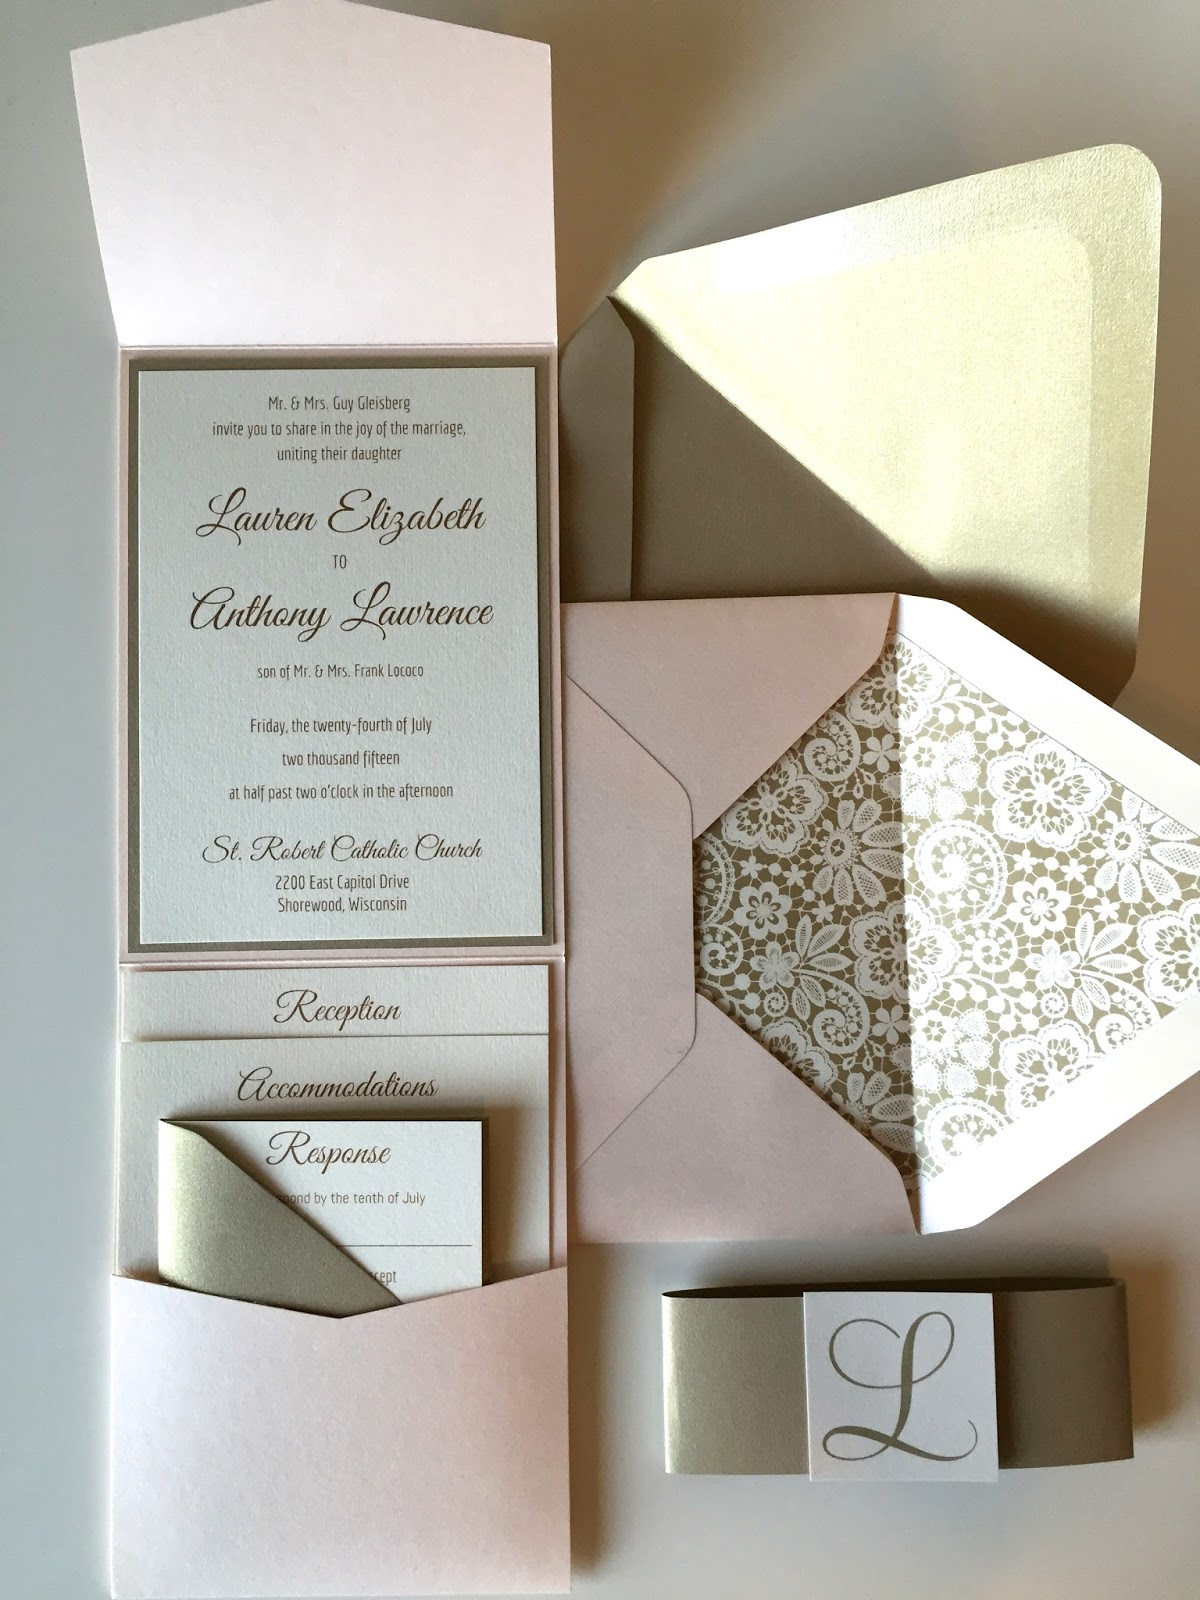 LIFESTYLE JOURNAL WEDDING INVITATION PROGRAM Lauren Gleisberg – Most Beautiful Wedding Invitations